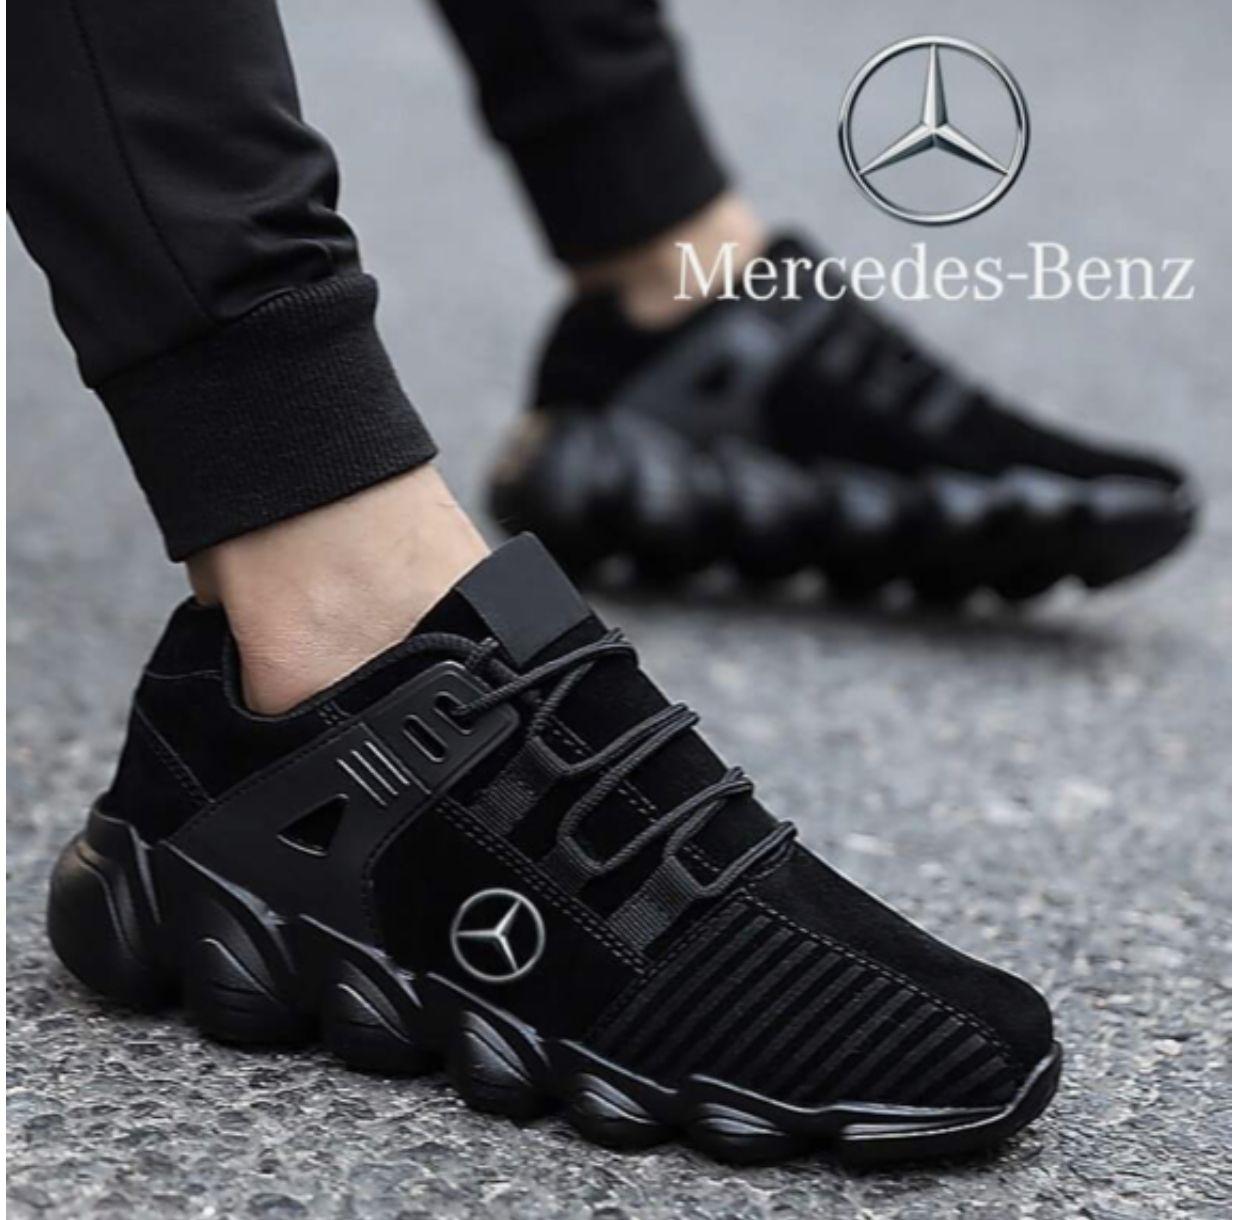 Mercedes Benz All Black Tennis Shoes Running Shoes For Men Black Tennis Shoes Running Shoes [ 1220 x 1242 Pixel ]